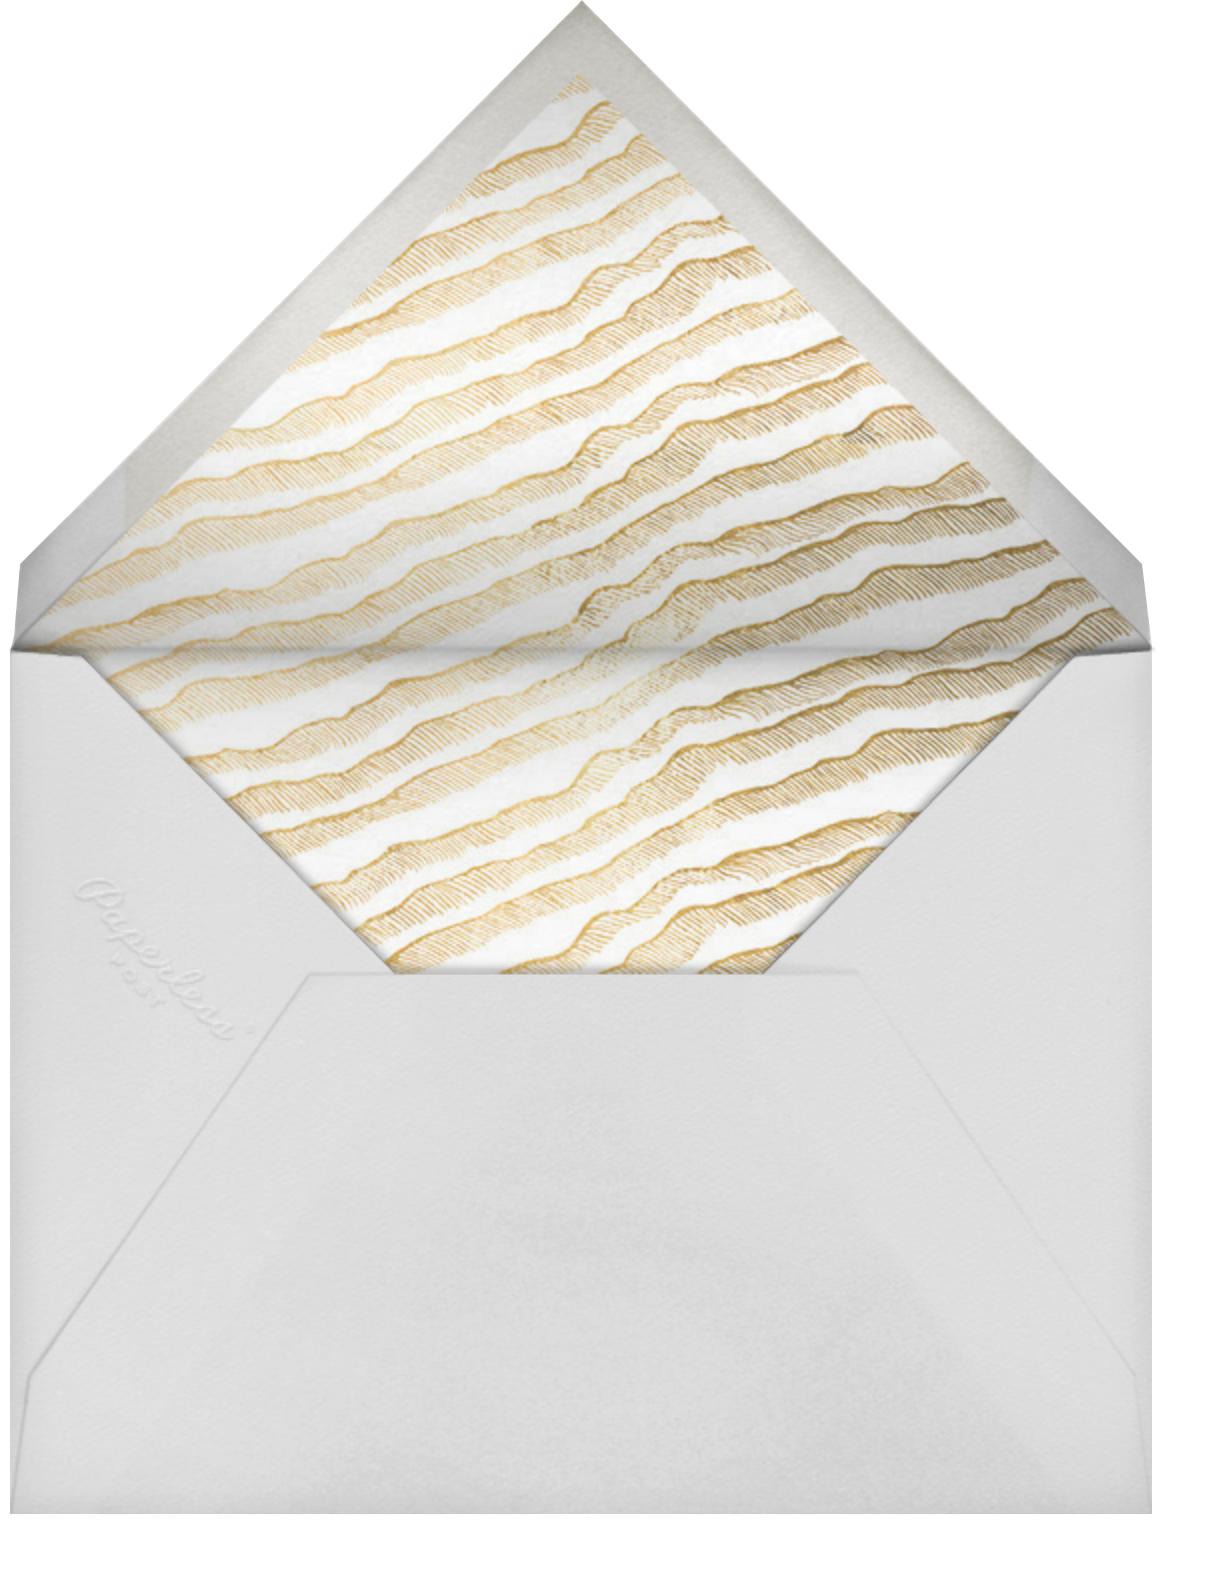 Cascadia - Midnight - Kelly Wearstler - Birthday - envelope back